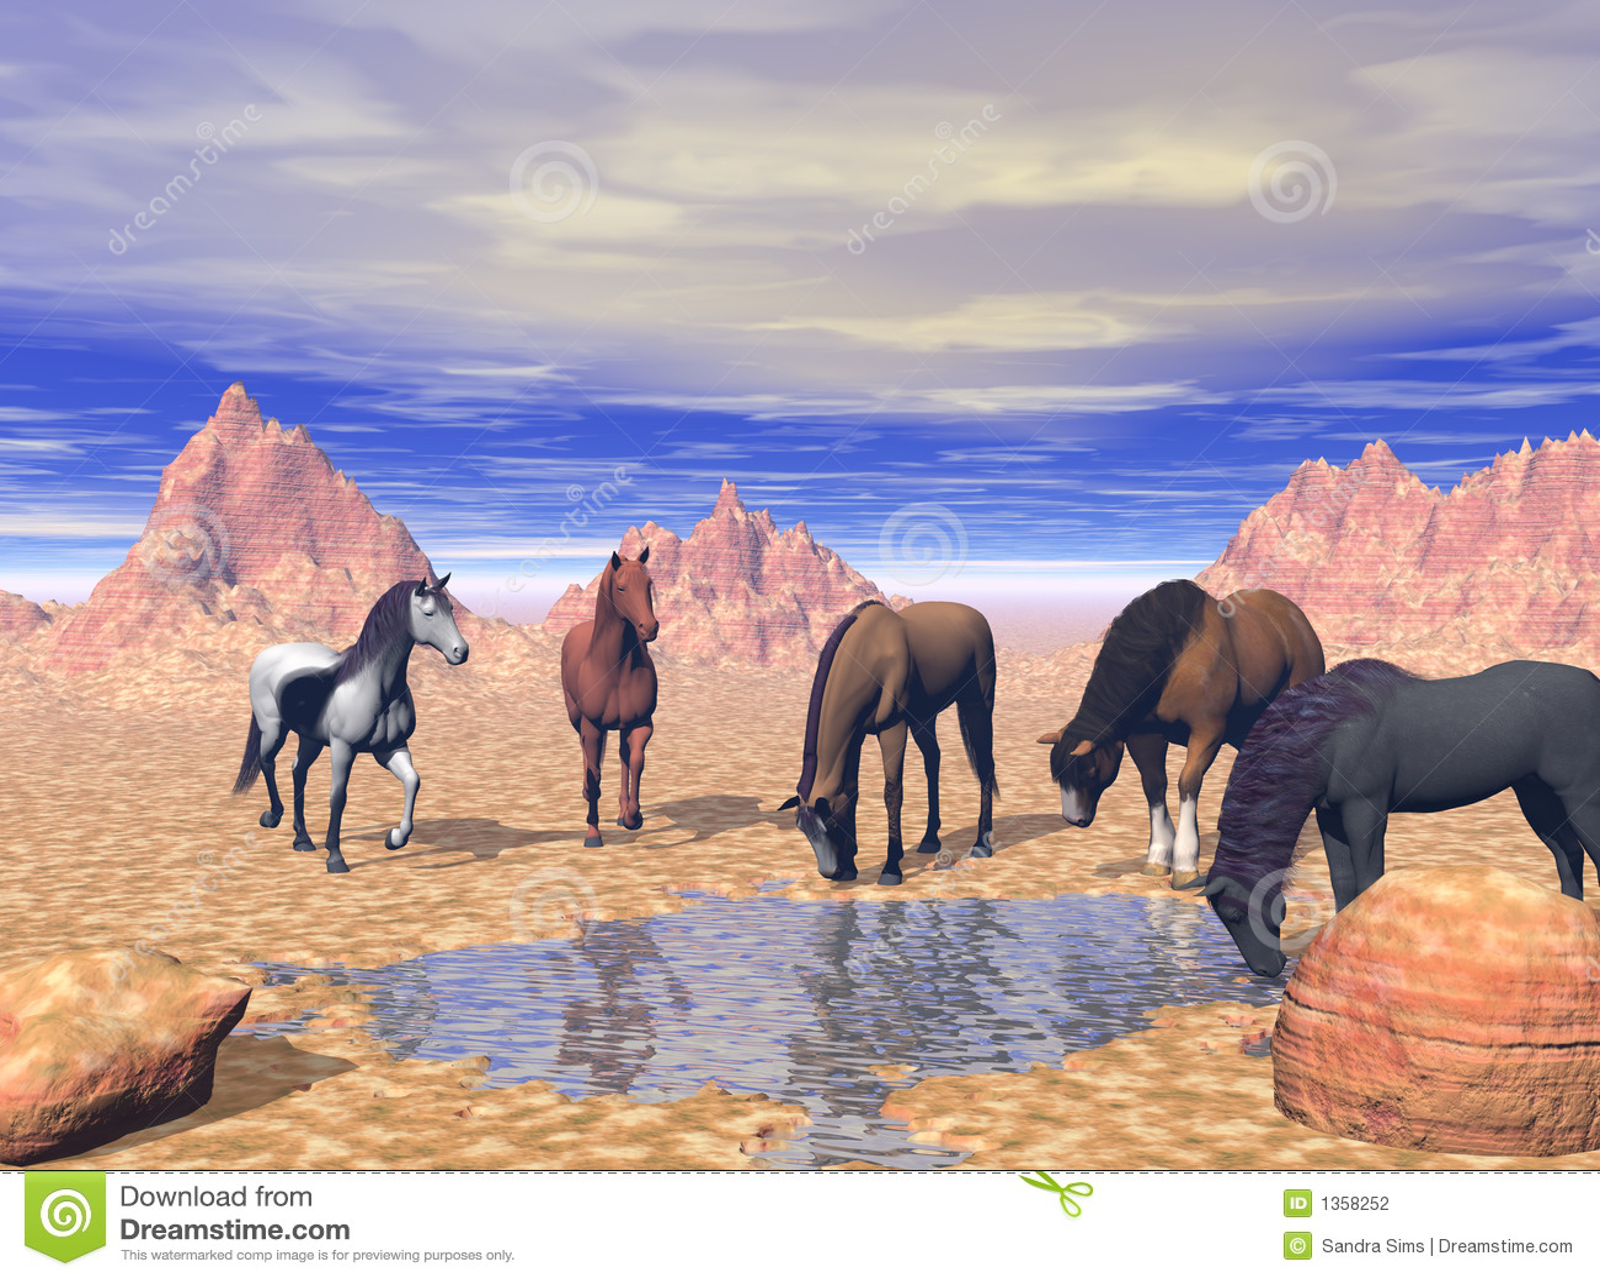 7 Horse Wallpaper 3d Desert Watering Hole Stock Illustration Image Of